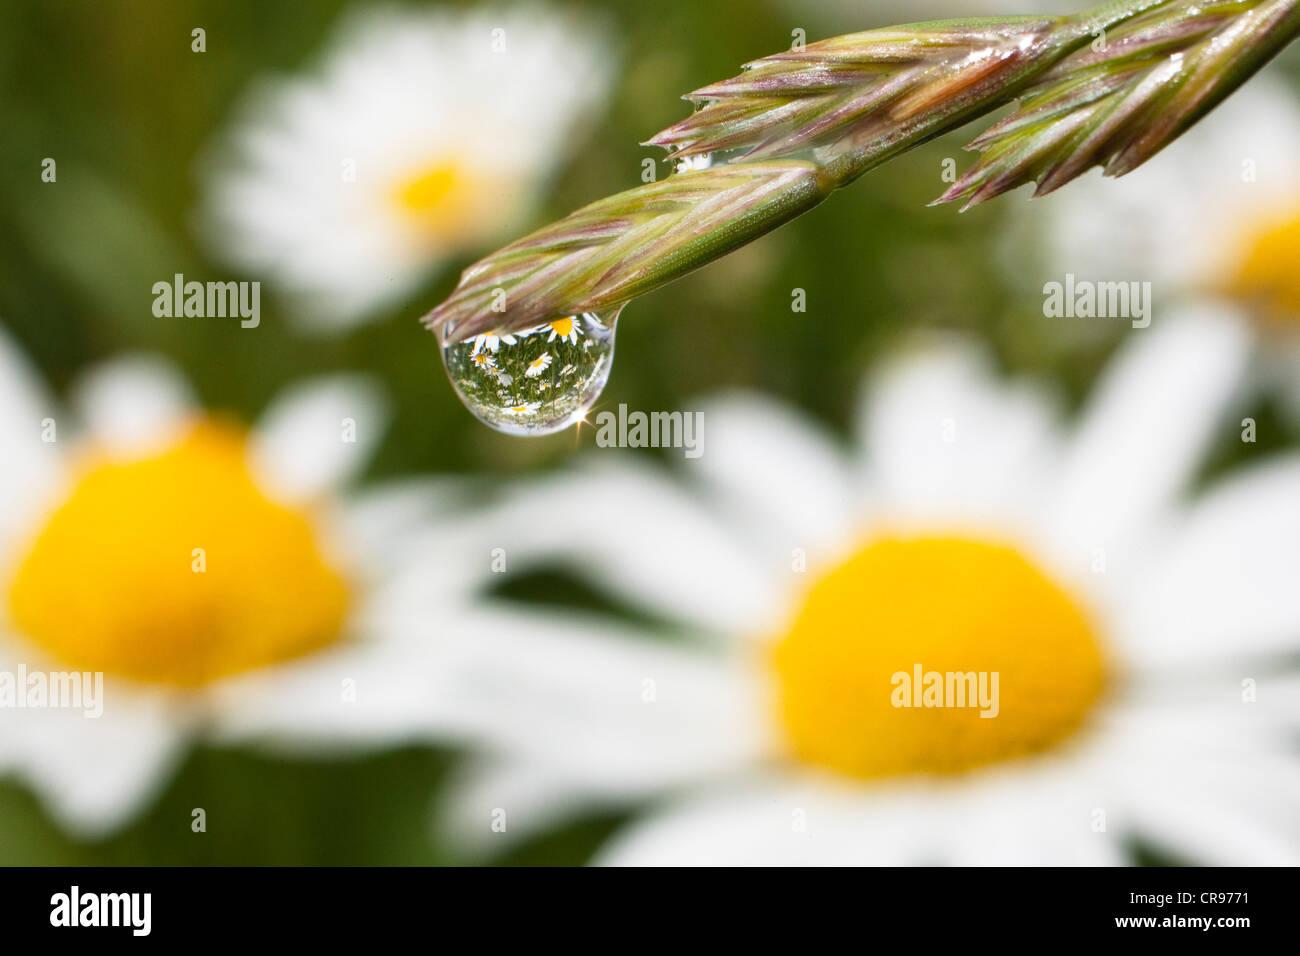 Dew drop on grass and Daisies (Leucanthemum vulgare), Upper Bavaria, Bavaria, Germany, Europe - Stock Image